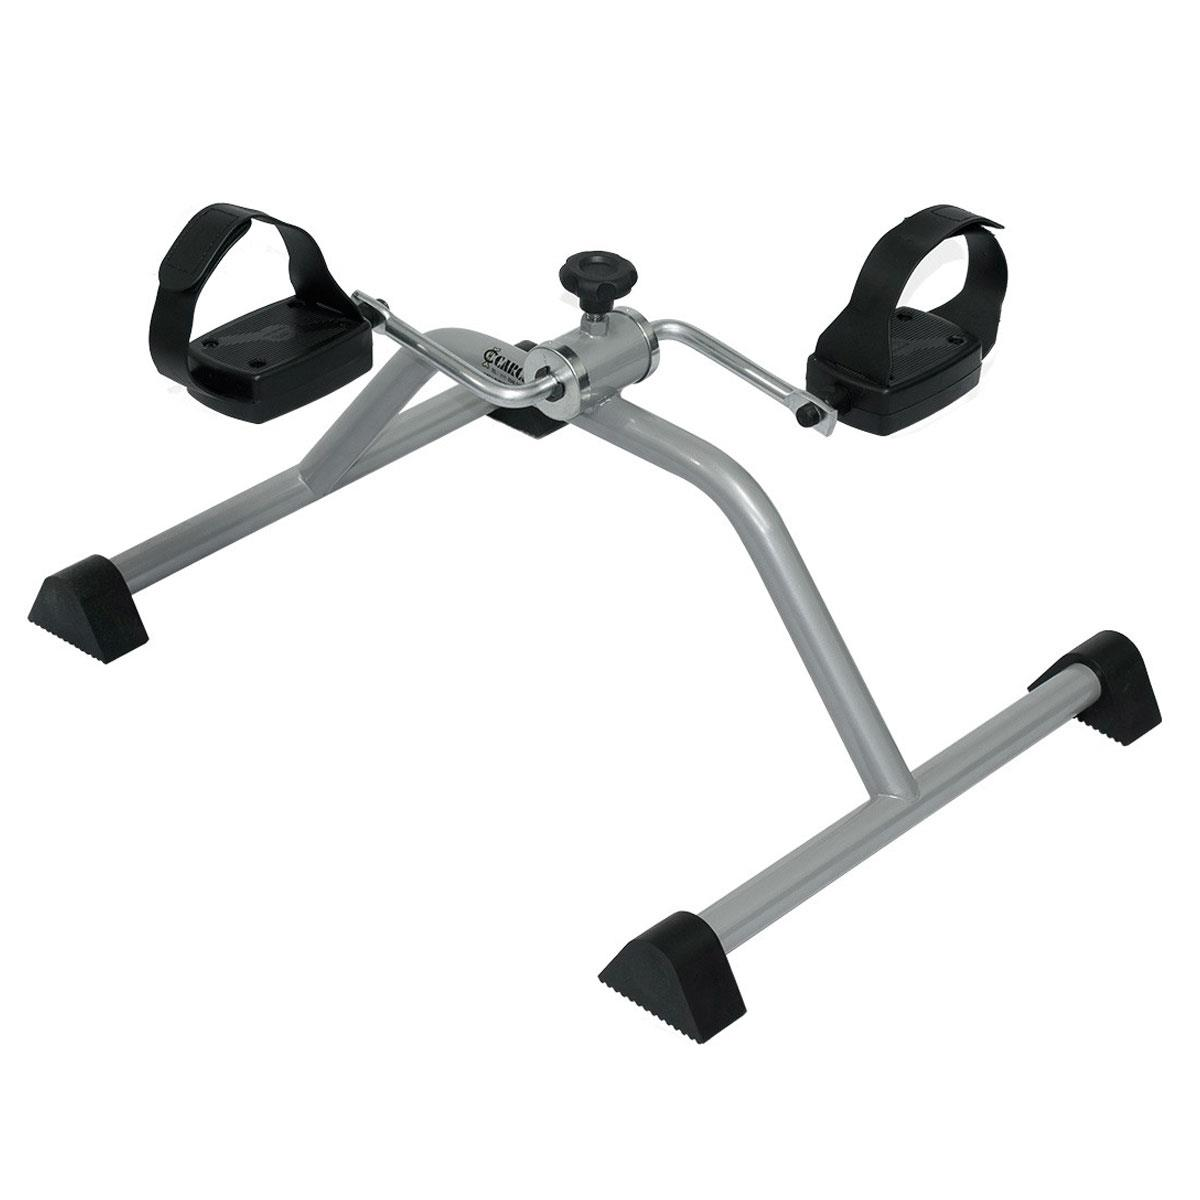 Pedalinho Mini Bike Para Fisioterapia - Carci